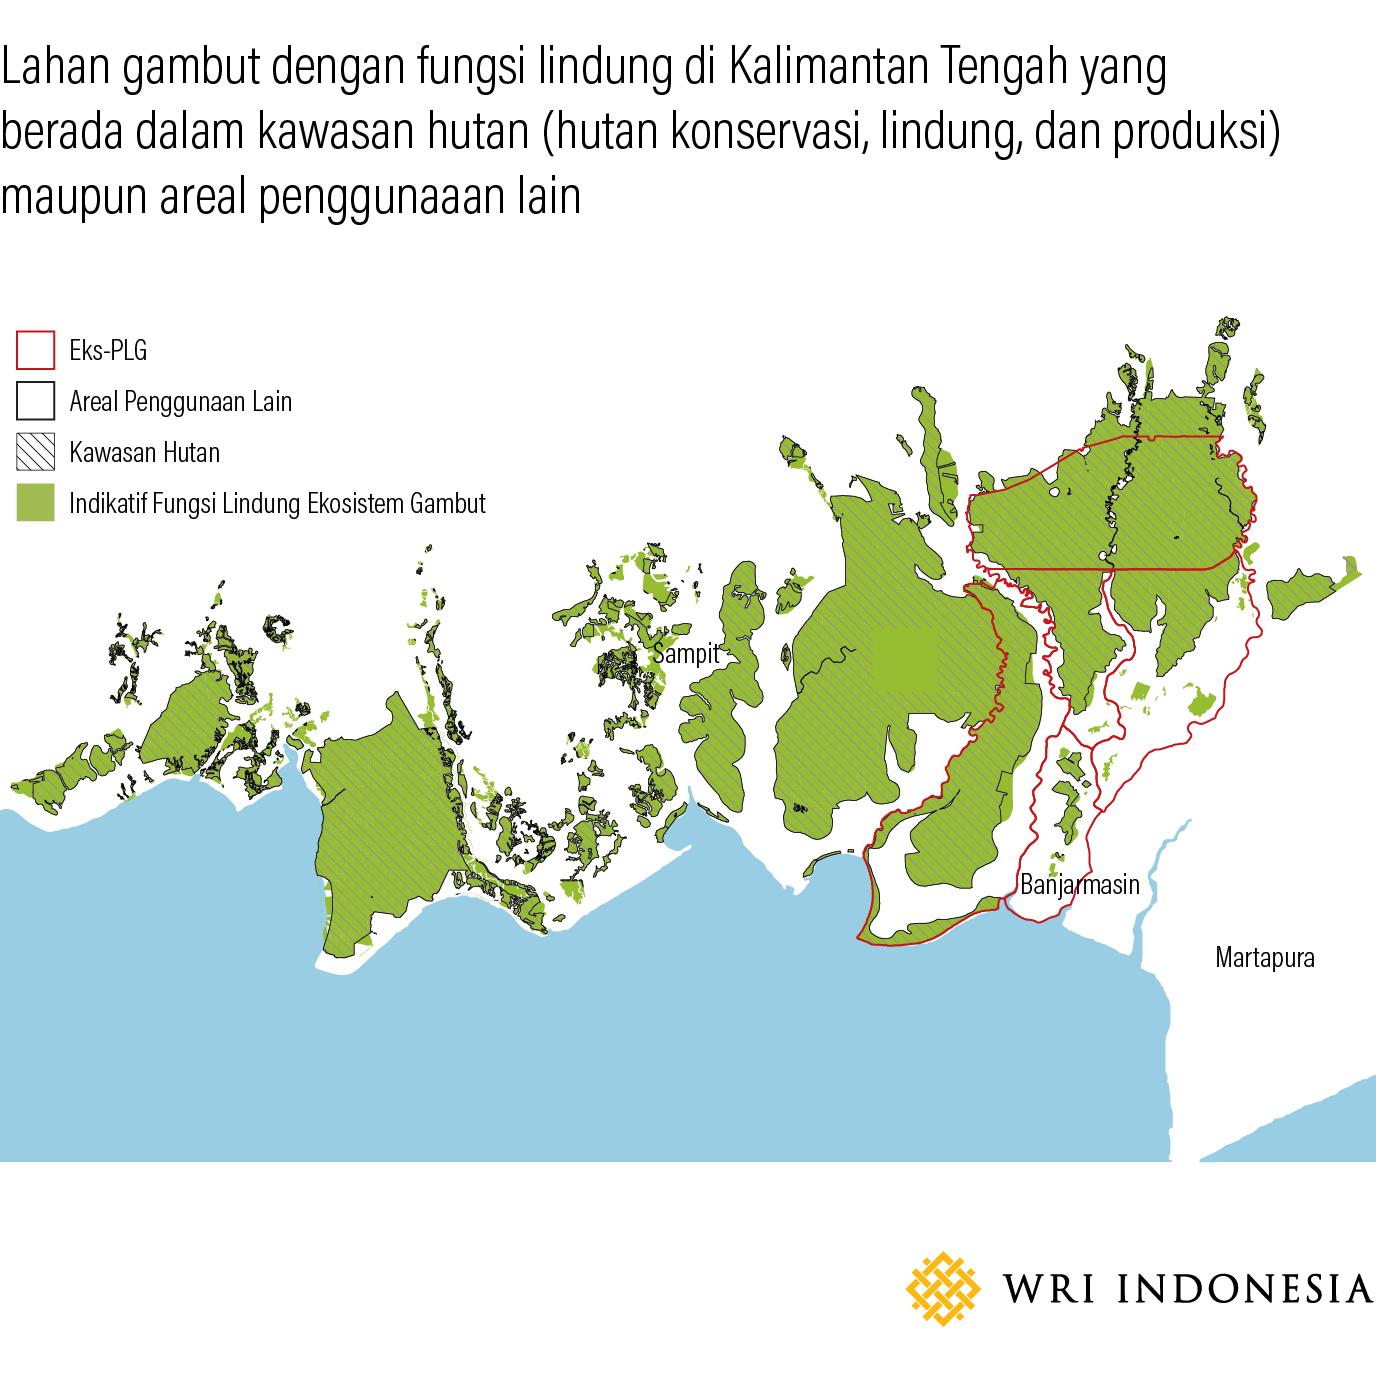 <p>Sumber: Kementrian Lingkungan Hidup dan Kehutanan (KLHK, 2019)</p>